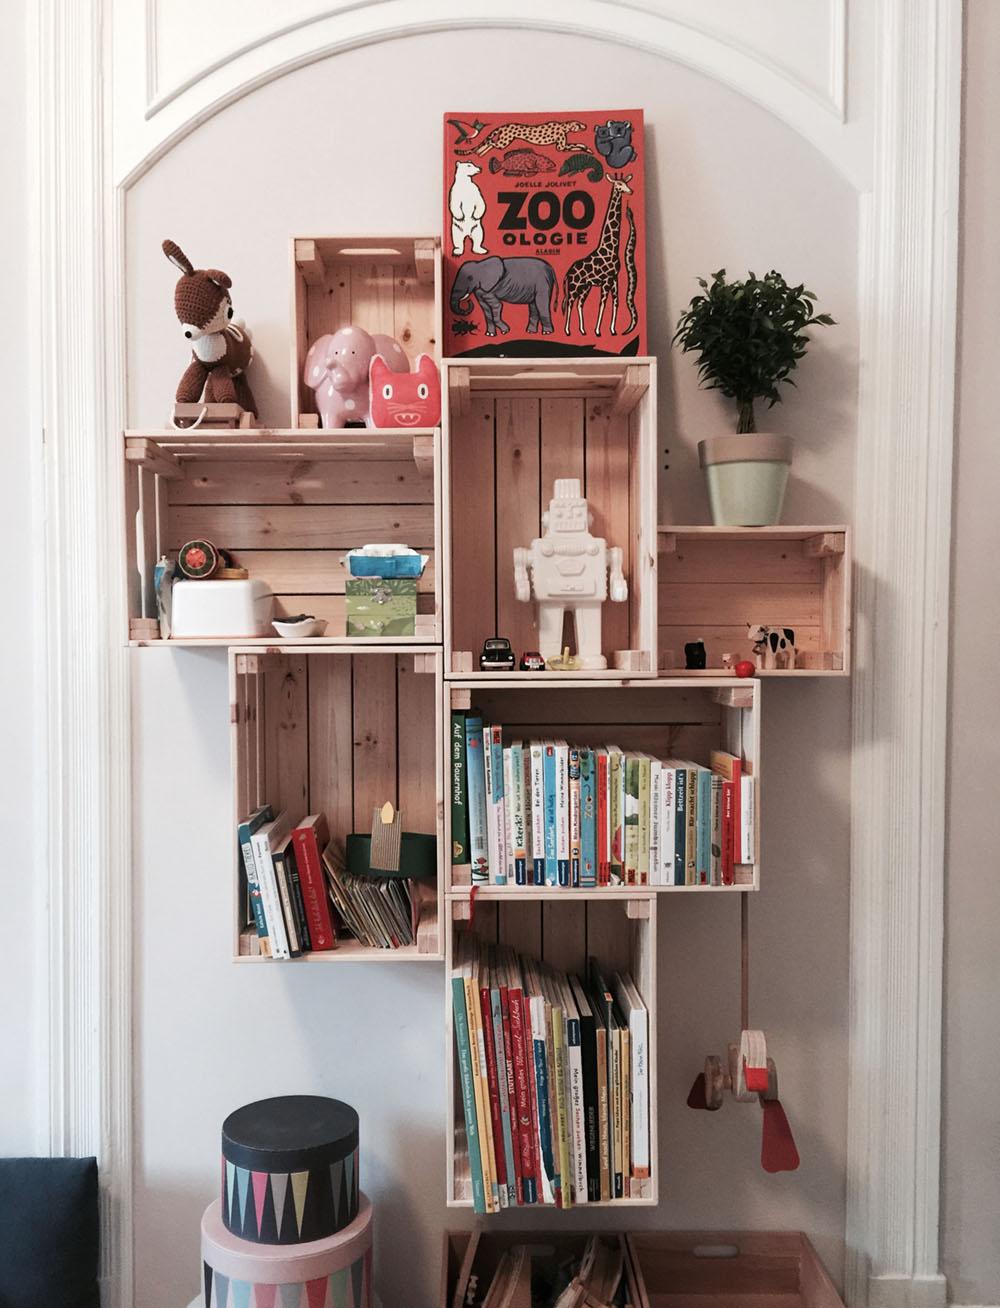 Full Size of Bücherregal Kinderzimmer Diy Das Perfekte Regal Im Sofa Weiß Regale Kinderzimmer Bücherregal Kinderzimmer